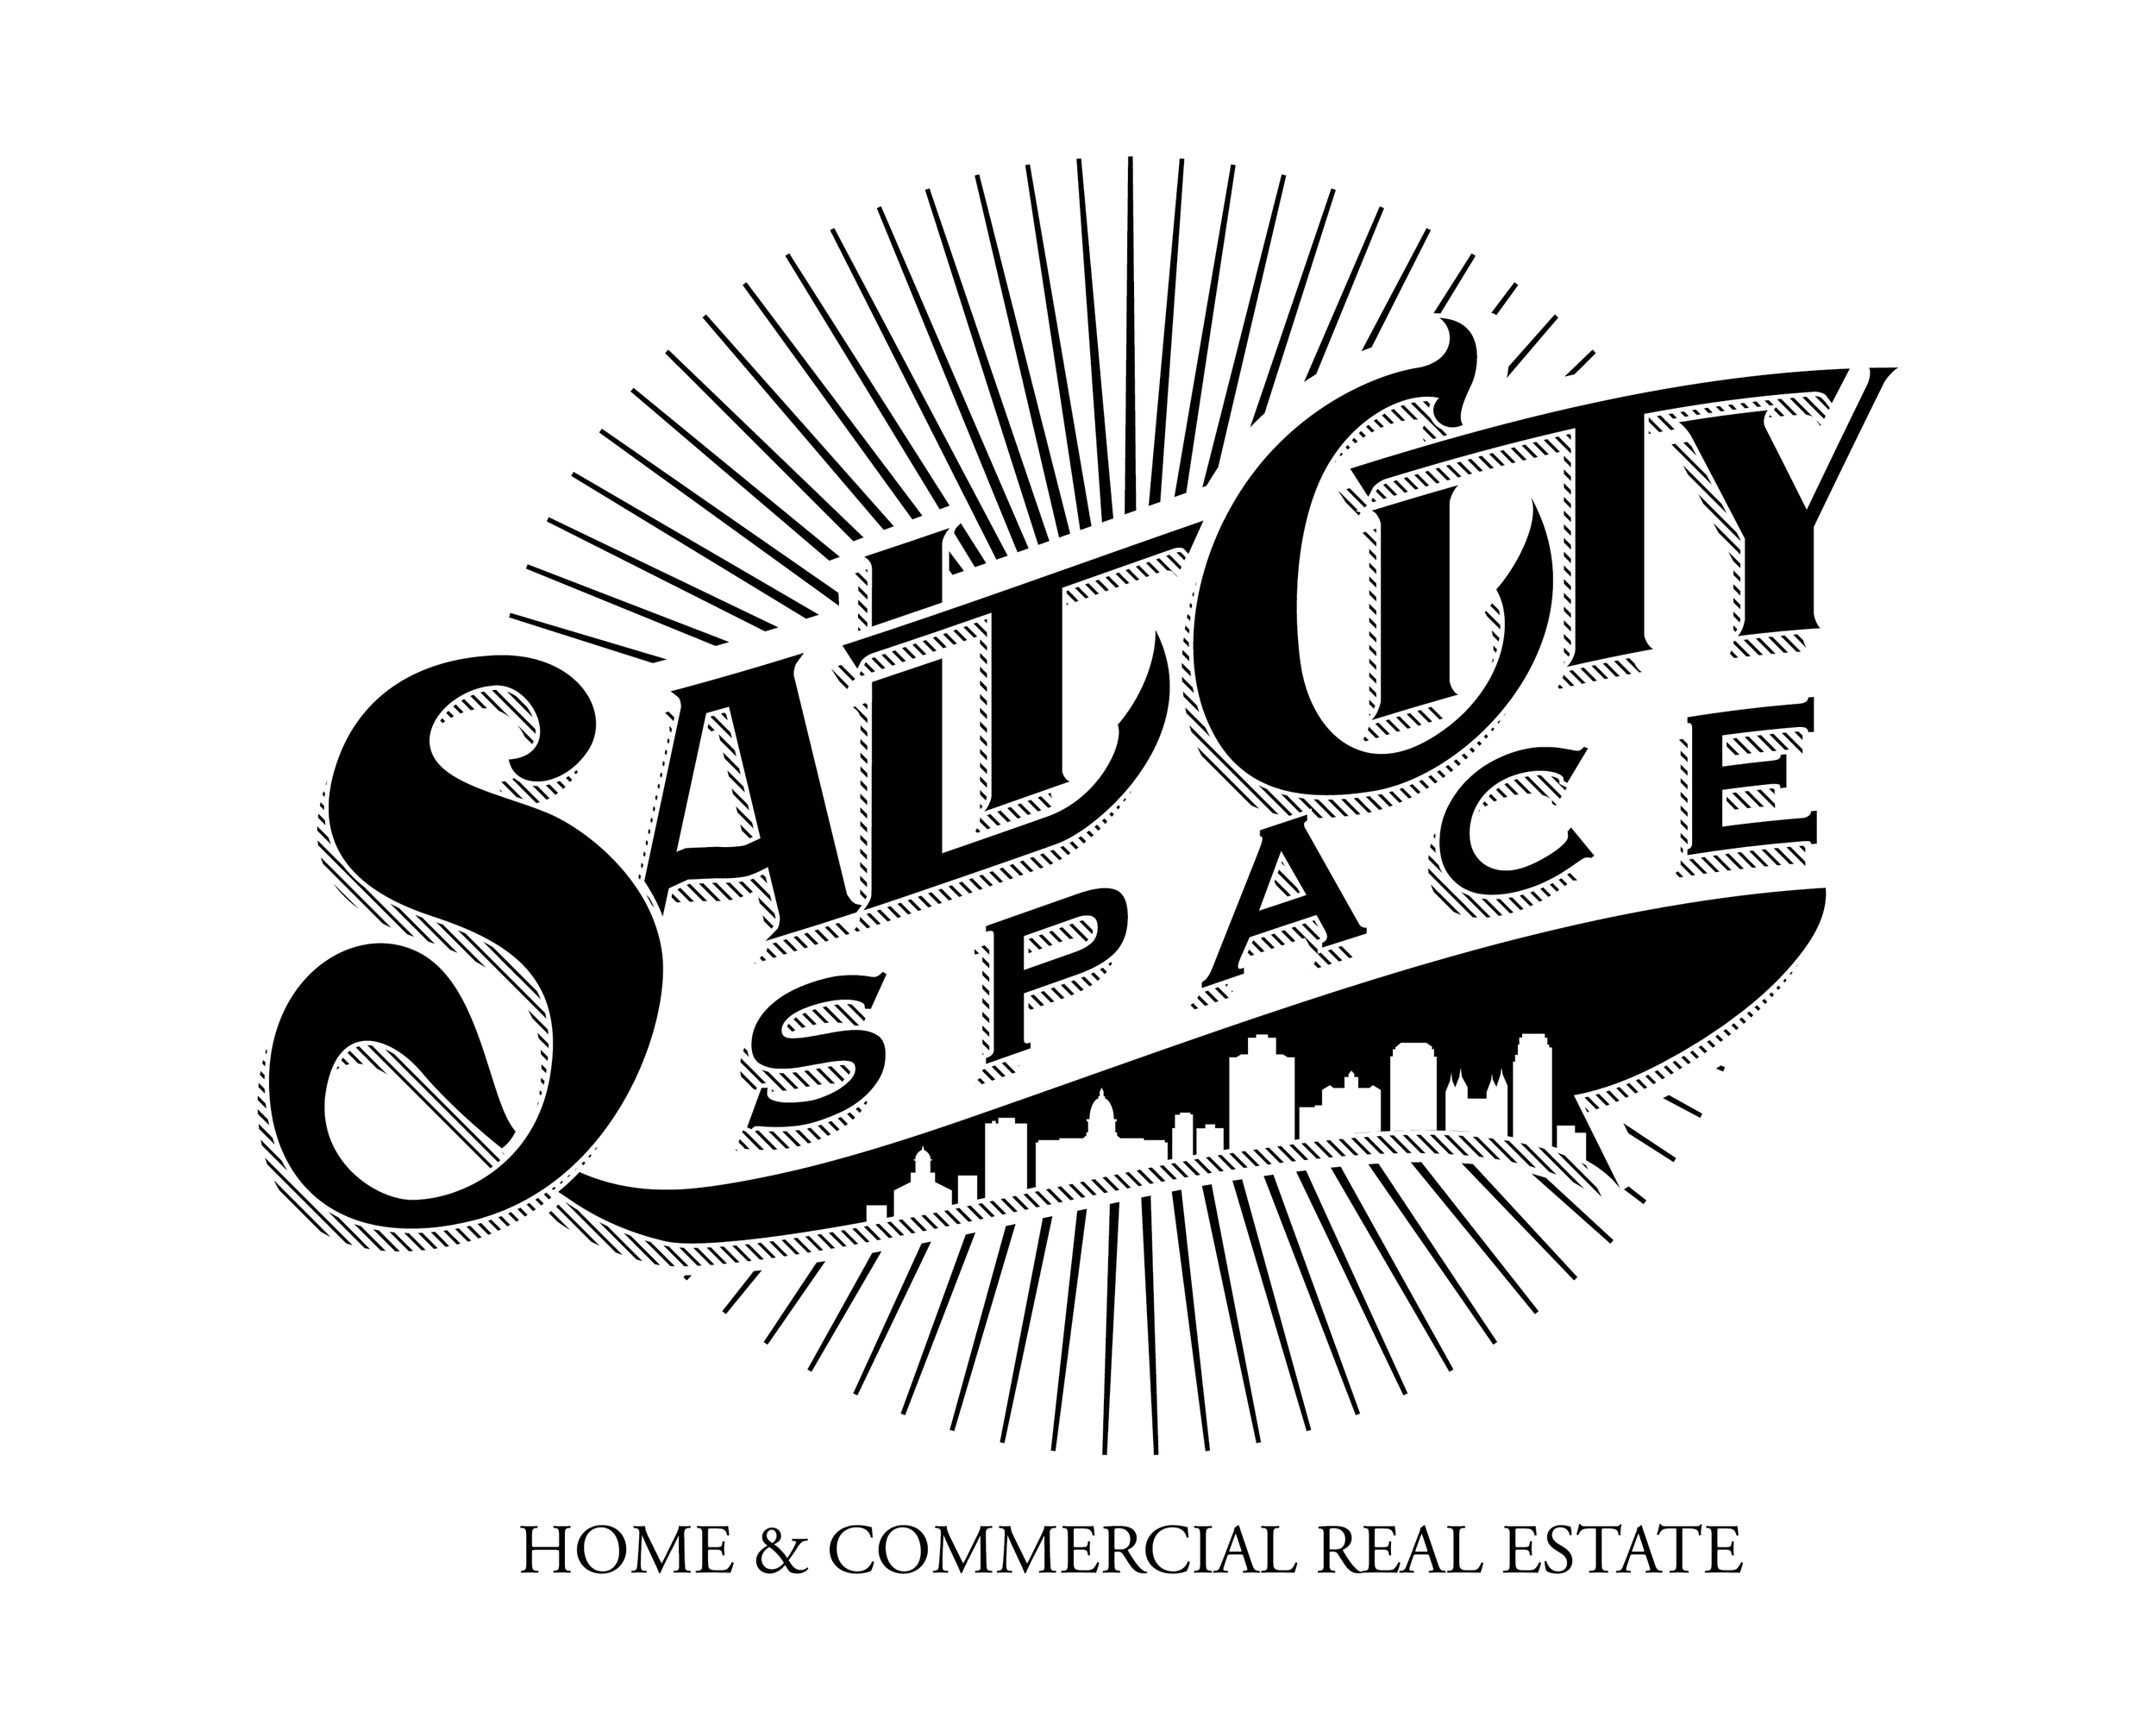 Salt_City_Space_Logo_B.png